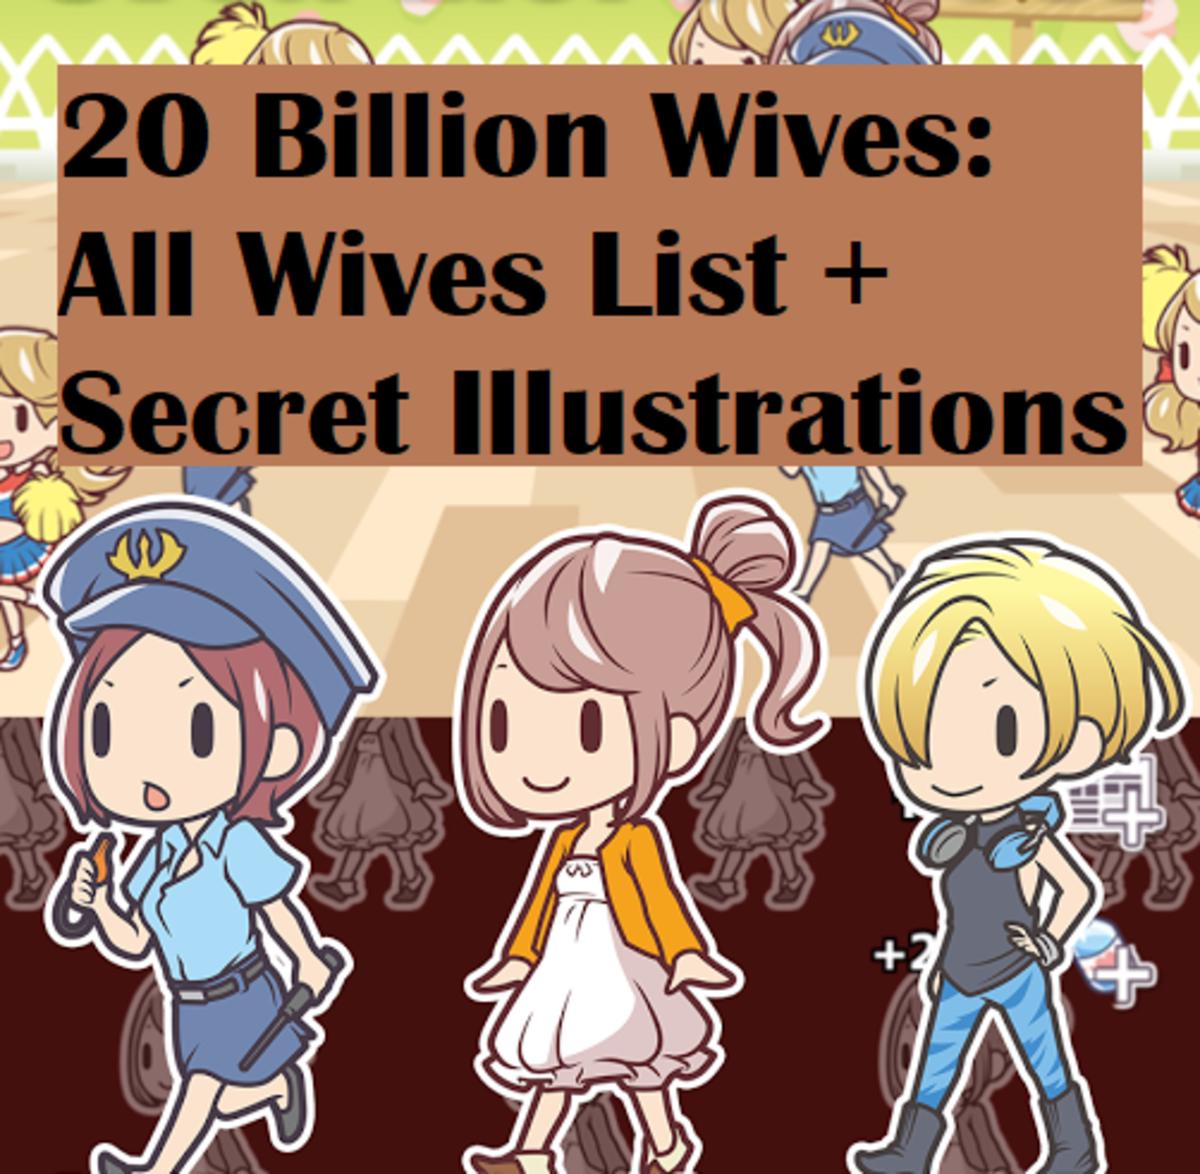 20 Billion Wives: All Wives List + Secret Illustrations